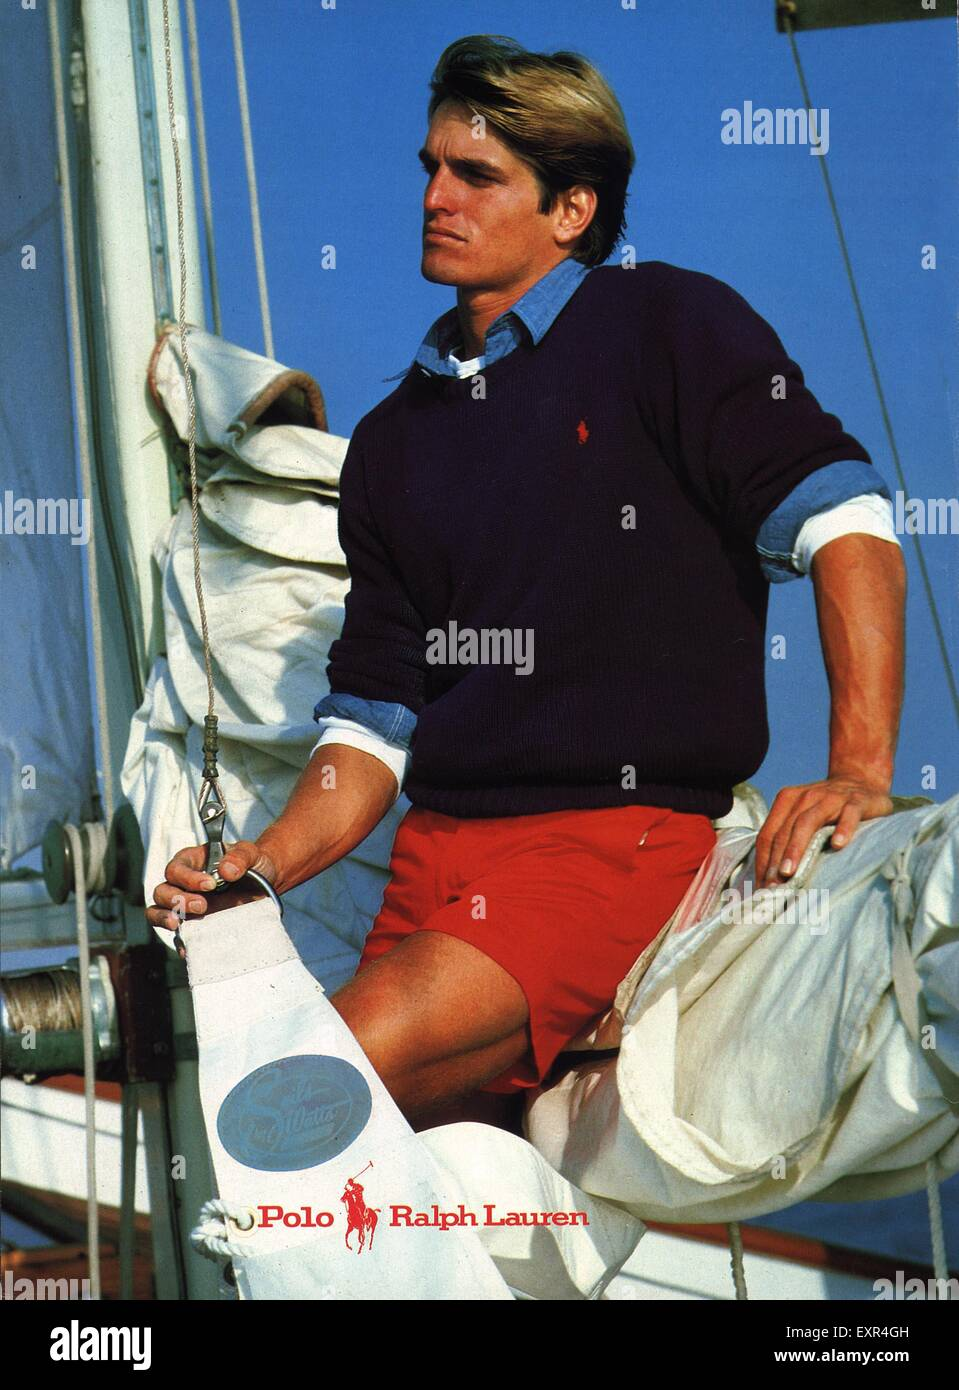 reputable site 4ca9f 2cb98 1990er Jahre UK Polo Ralph Lauren Herren Mode Magazin ...